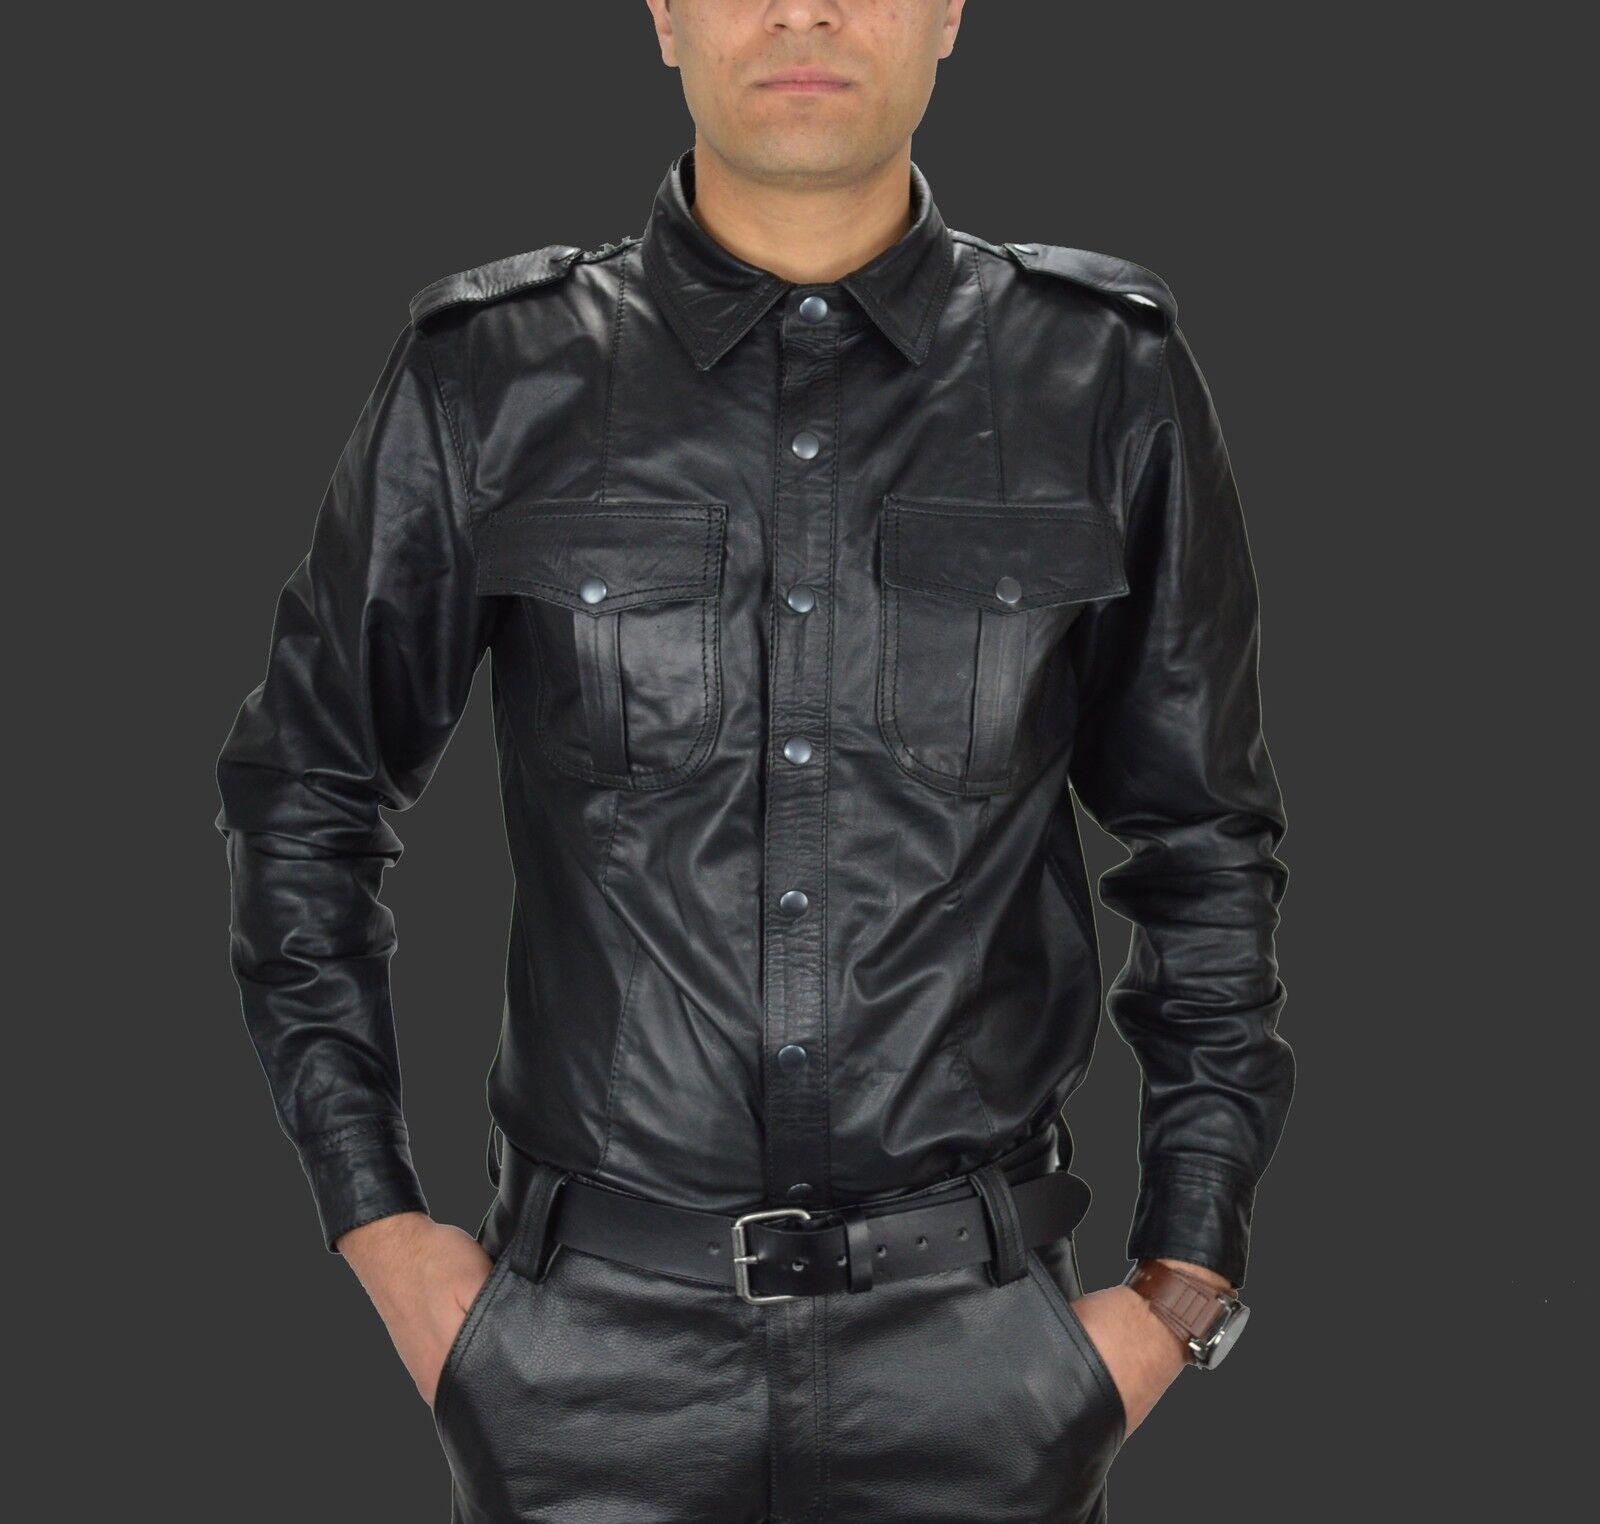 Mens Leather shirt,police style Gay leather shirt,lederhemd,Weste en Cuir,Hemd